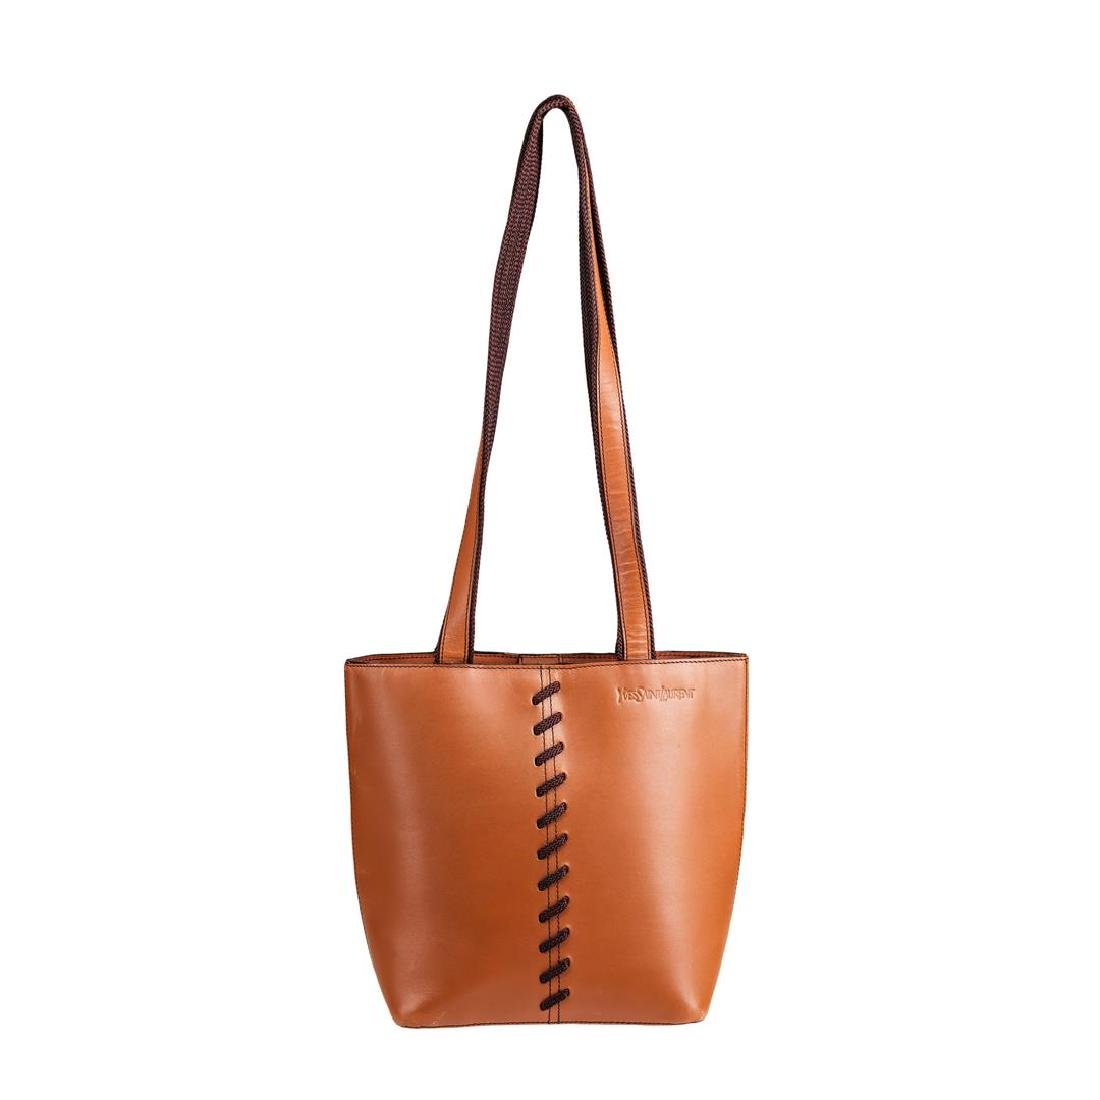 Yves Saint Laurent Brown Leather Bag